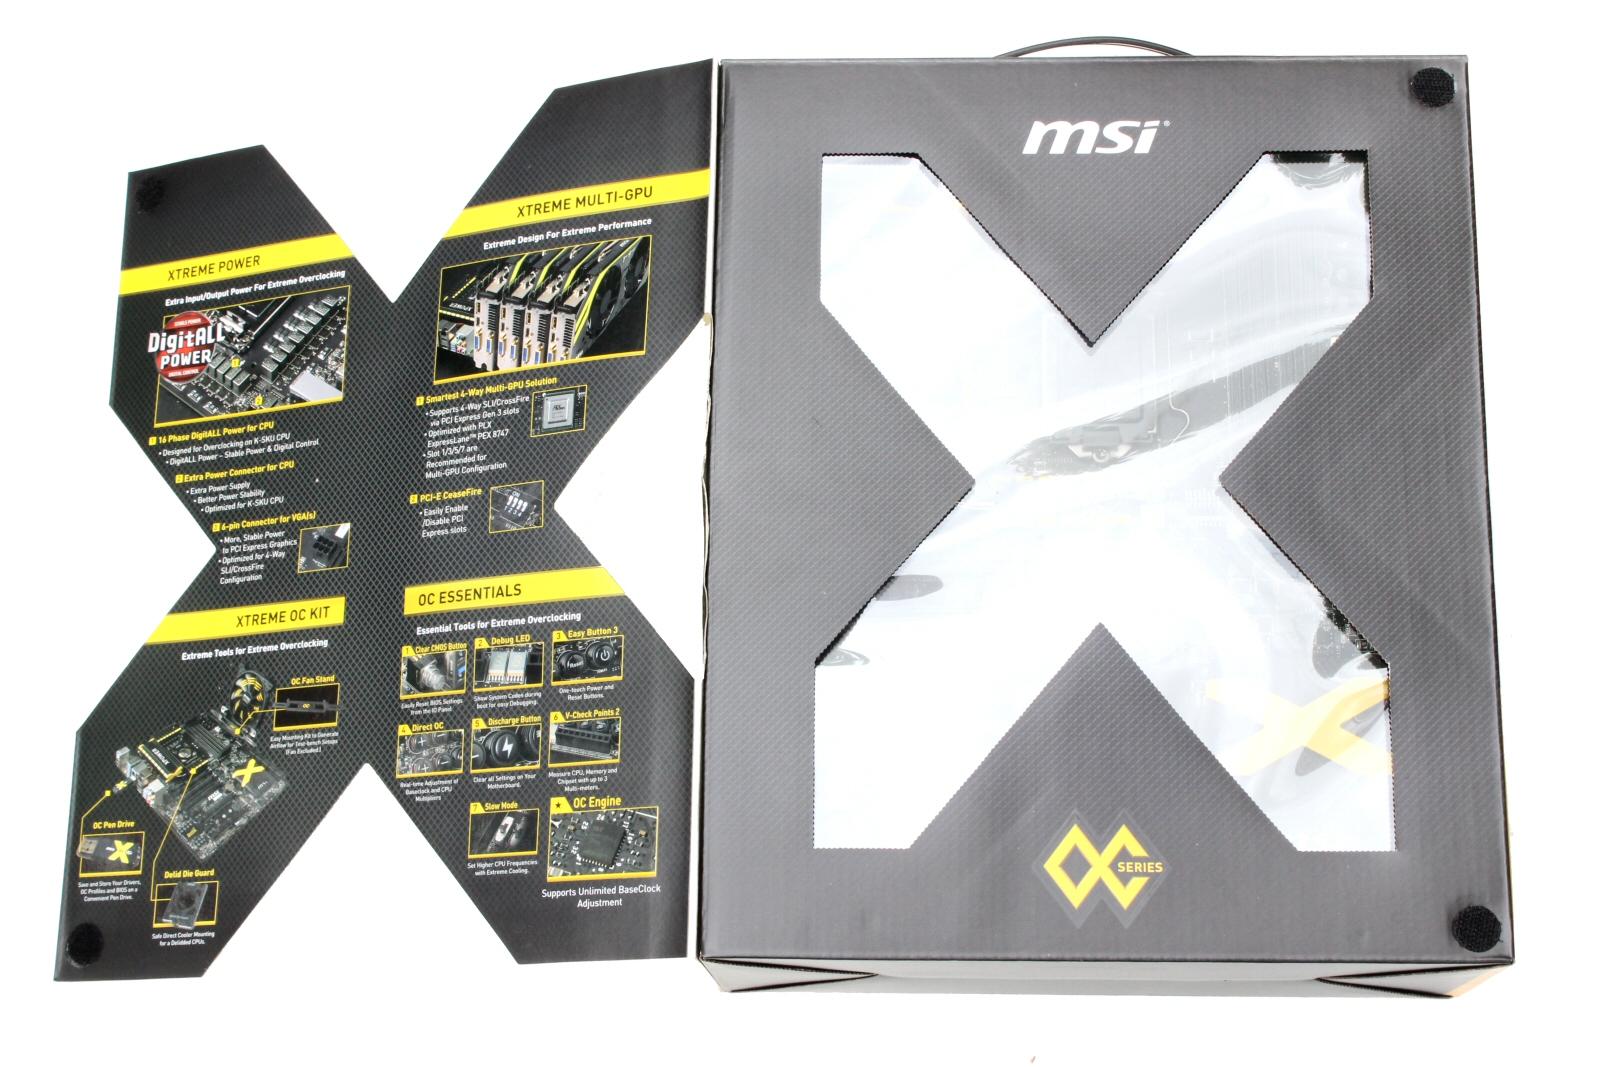 [Review] MSI Z97 XPower AC-img_5244.jpg